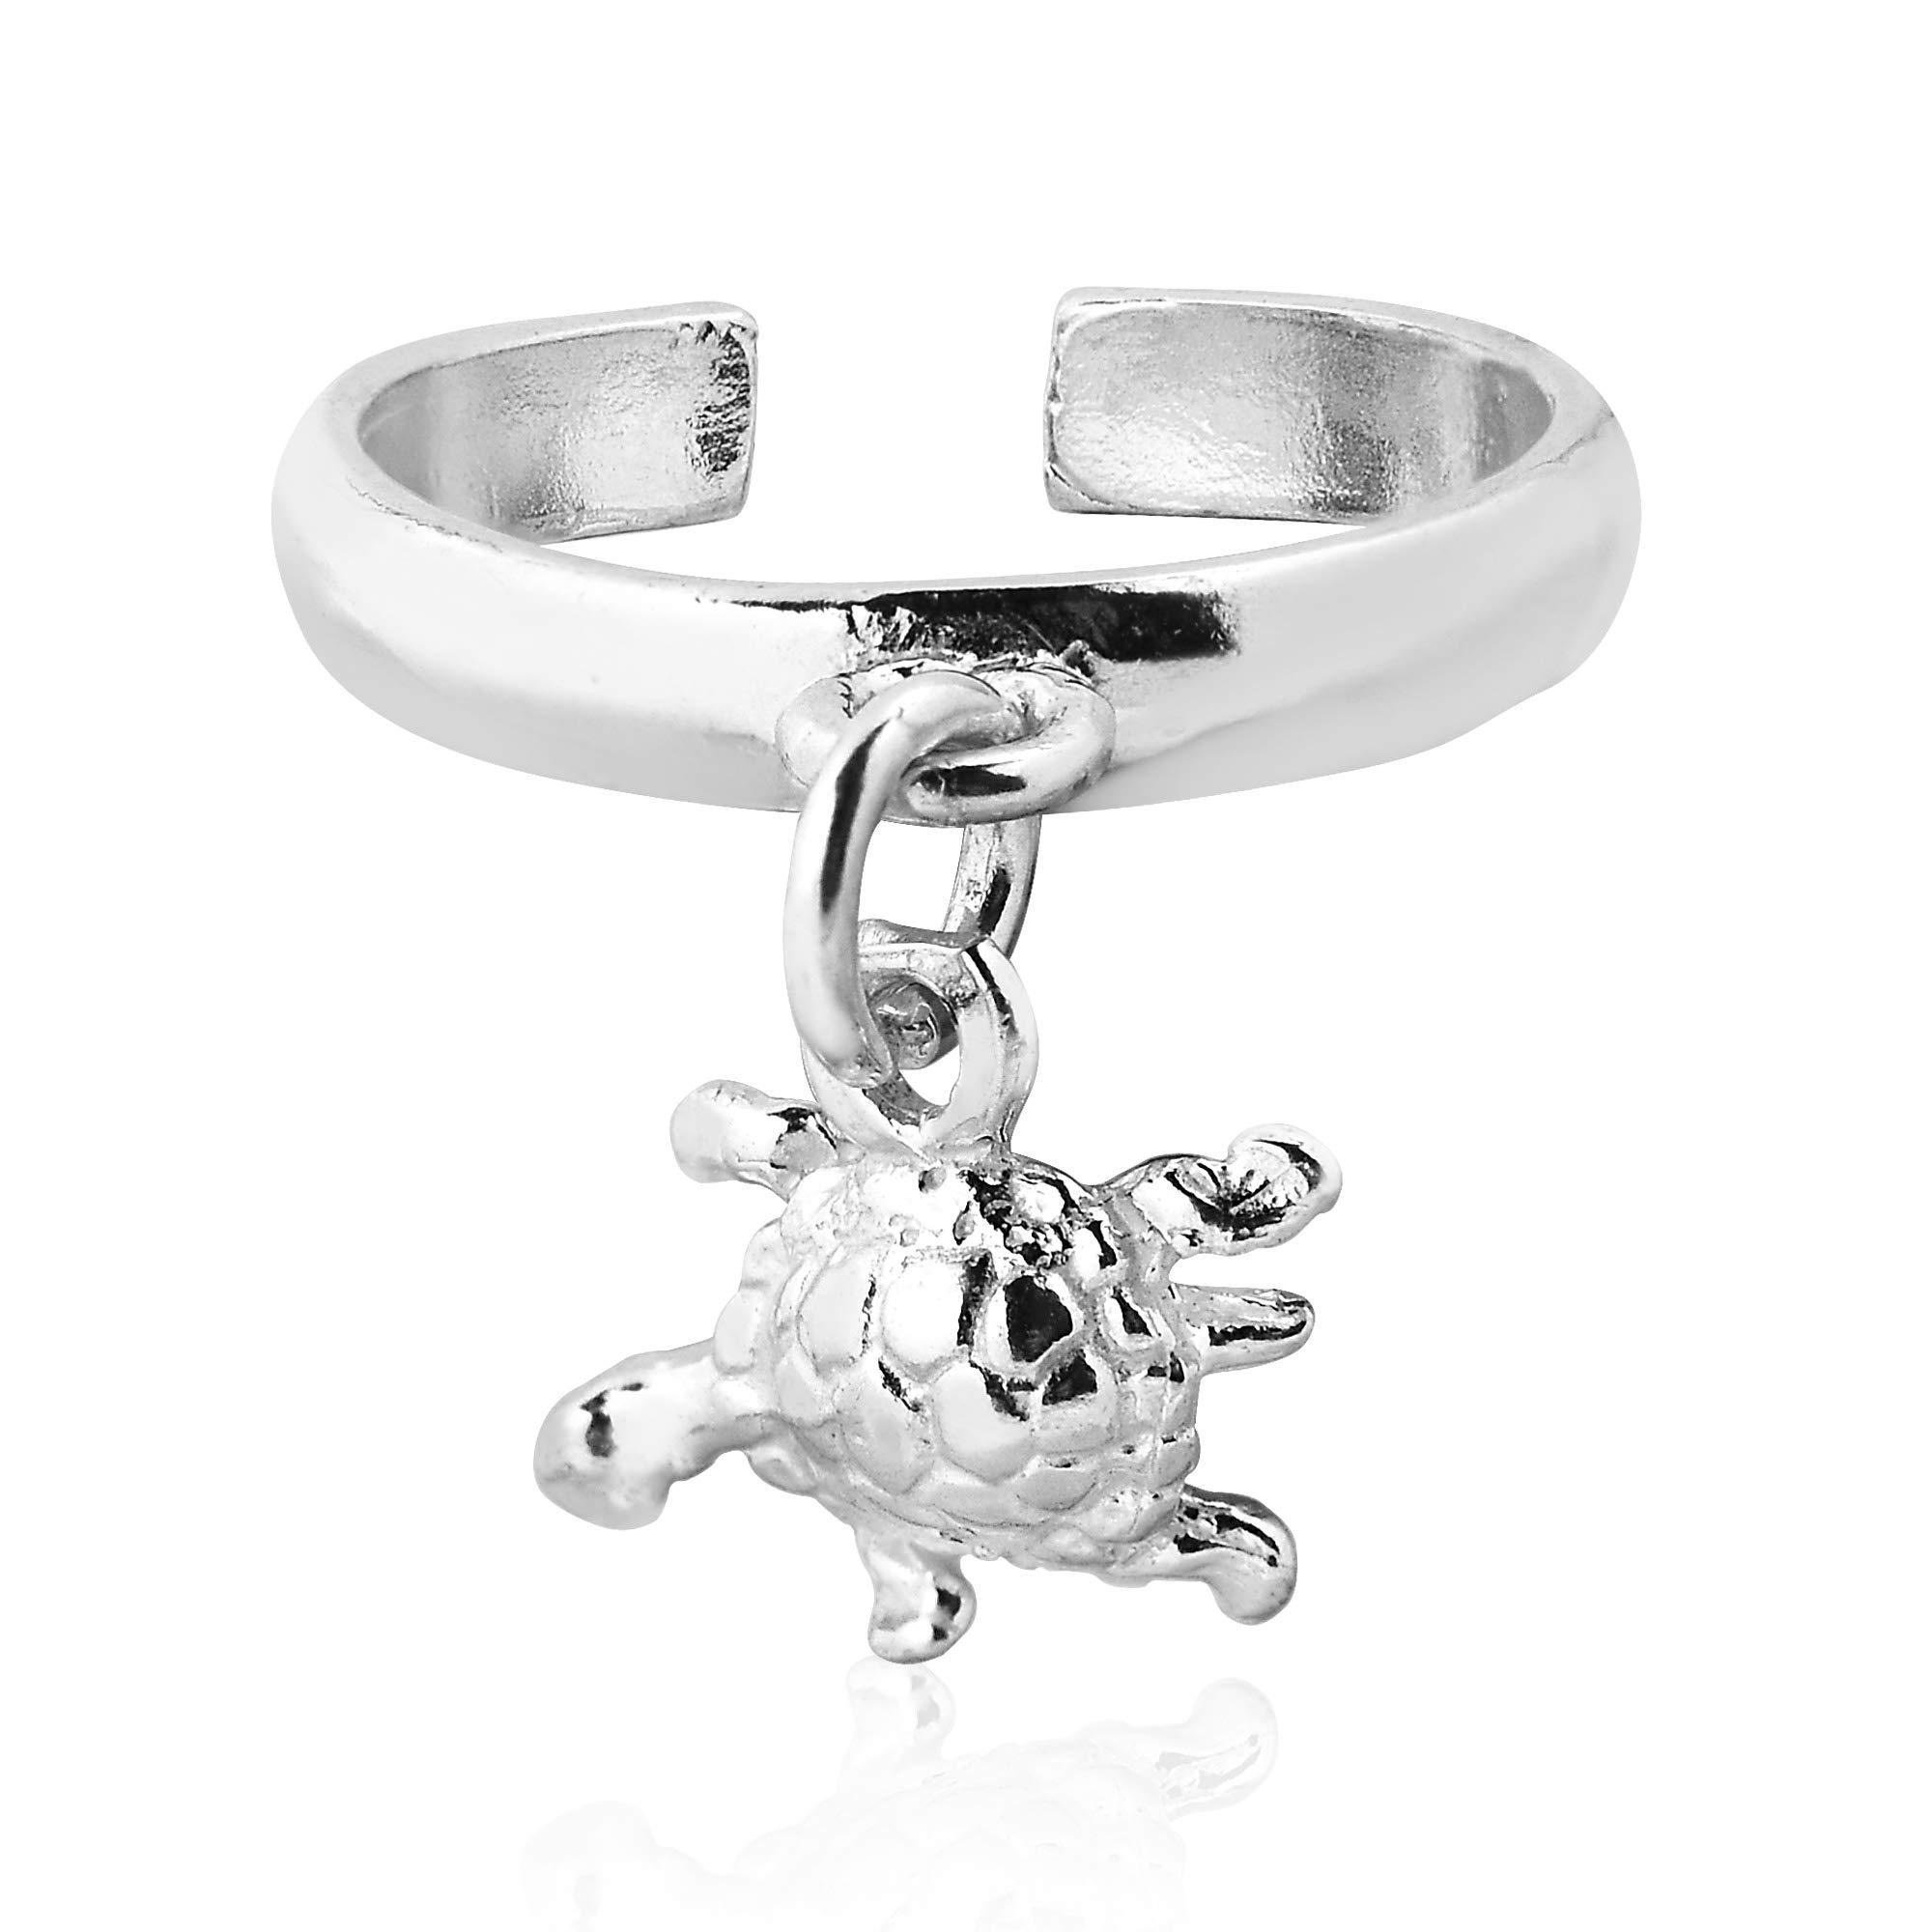 AeraVida Cute Dangling Little Turtle .925 Sterling Silver Toe or Pinky Ring by AeraVida